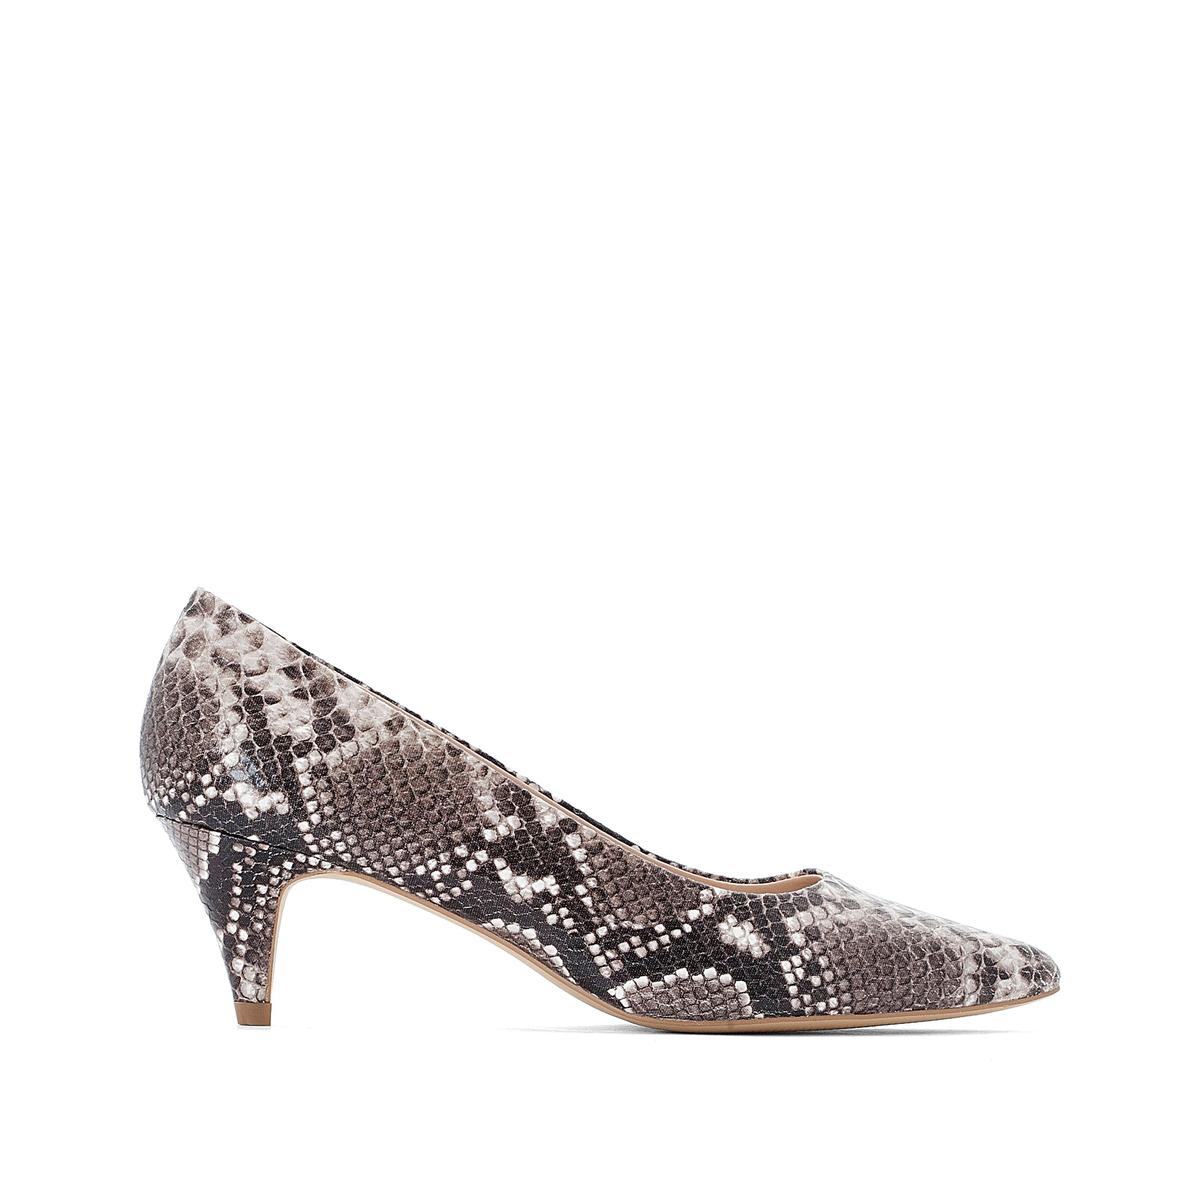 Туфли La Redoute На среднем каблуке с питоновым принтом 36 каштановый туфли la redoute на среднем каблуке с питоновым принтом 36 каштановый